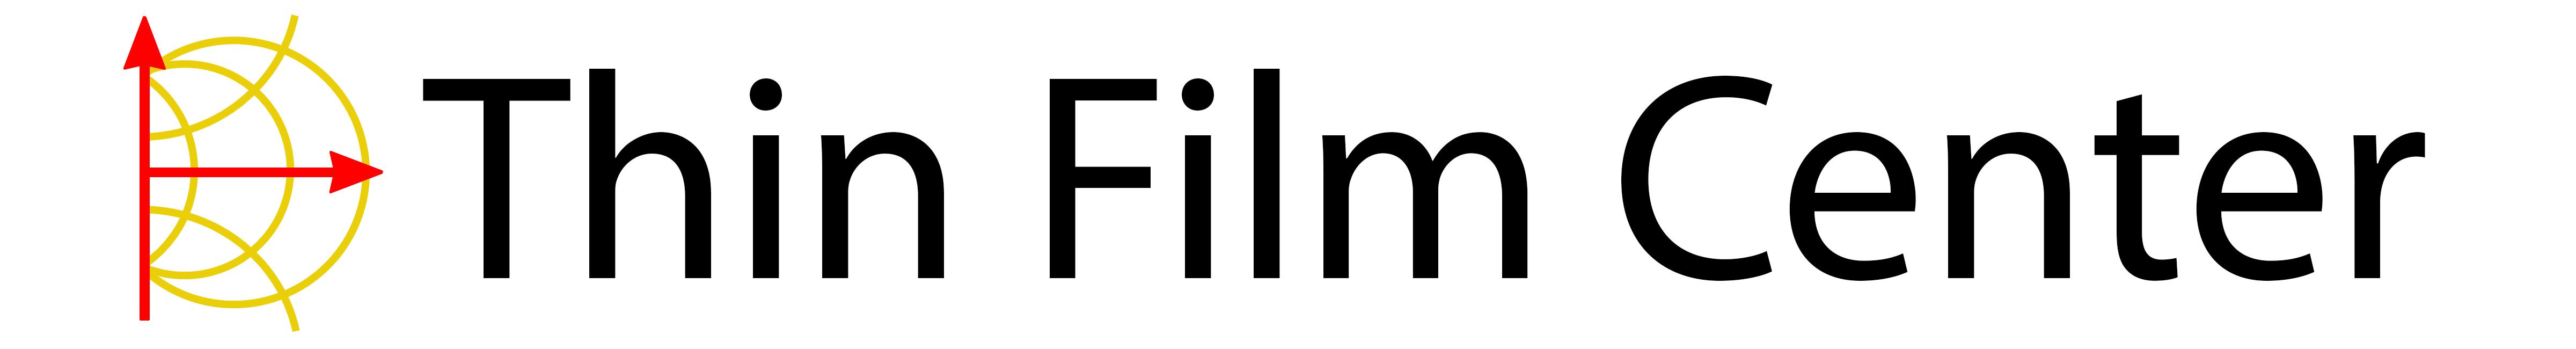 thin-film-center